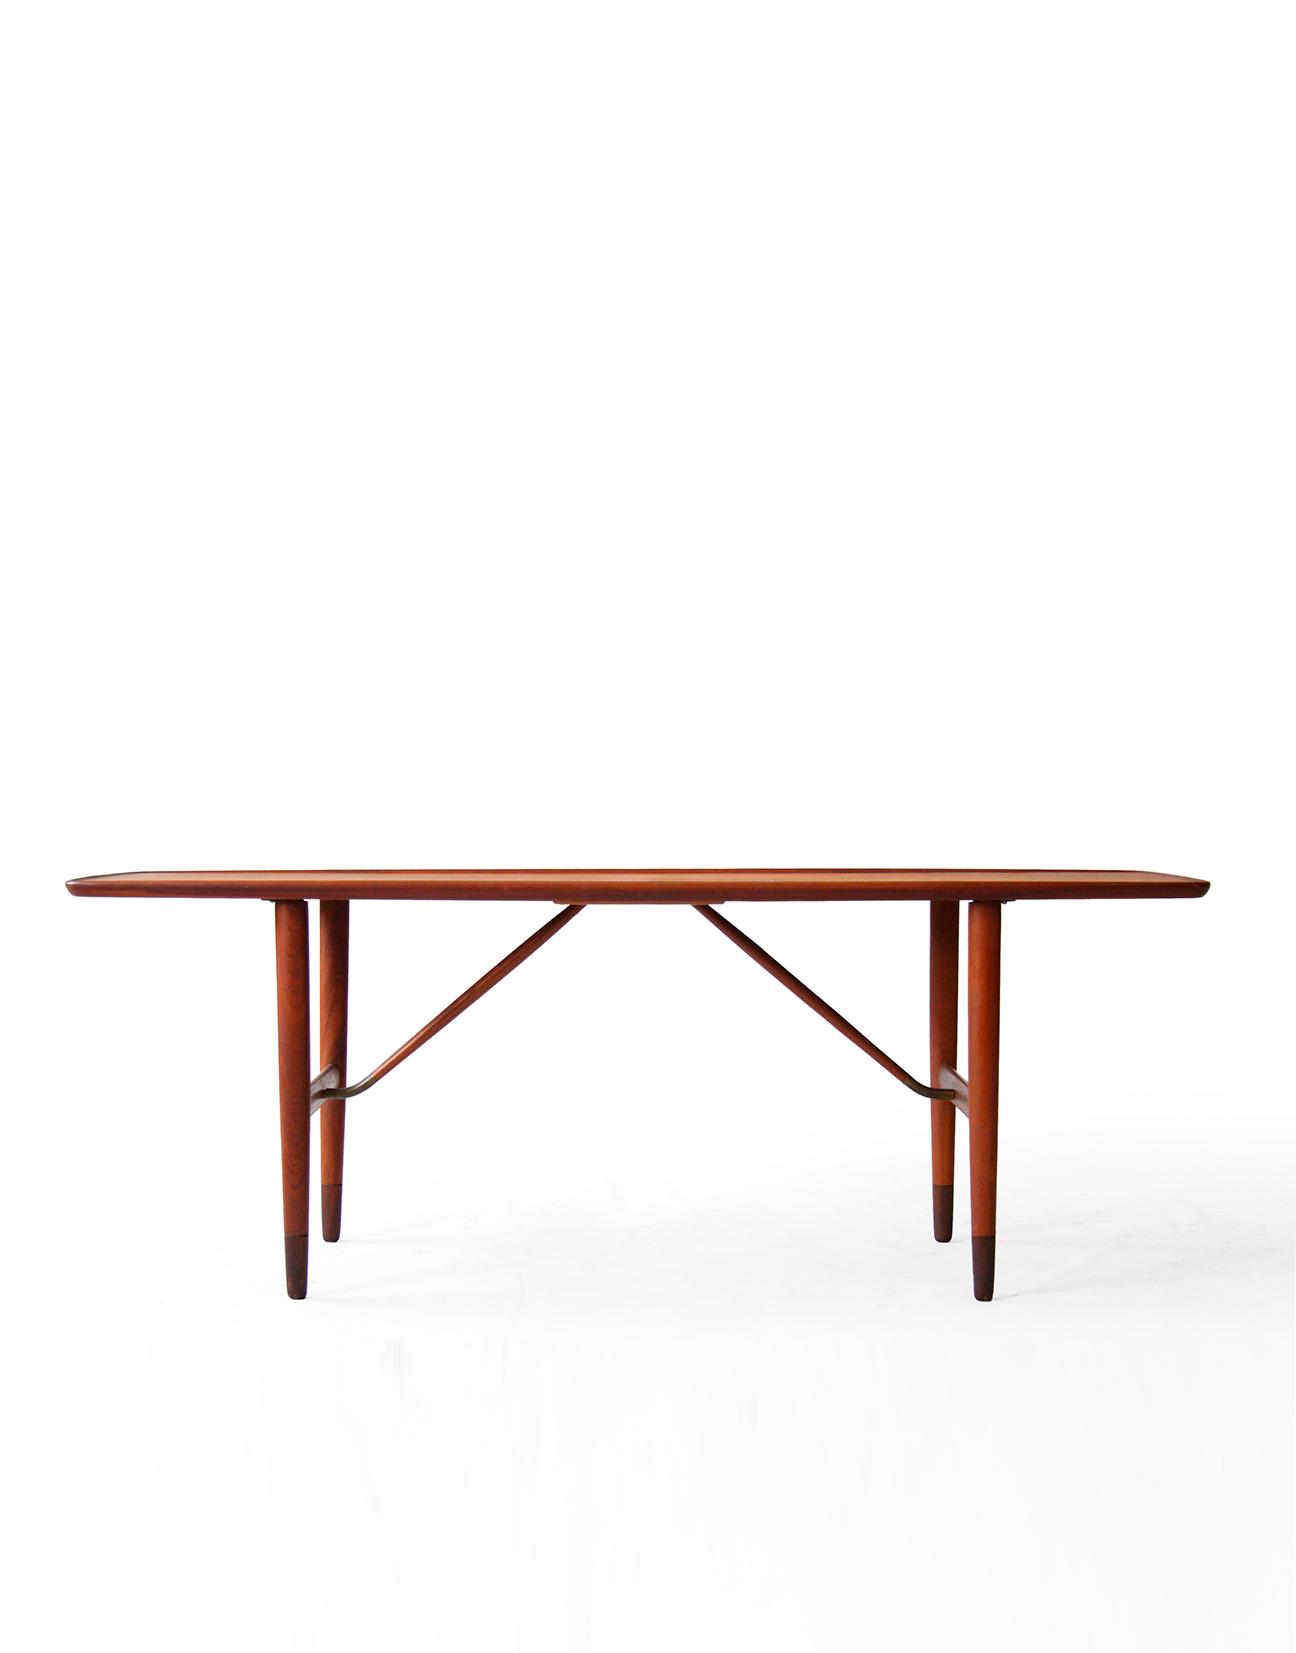 Danish Mid Century Modern Teak and Brass Coffee Table